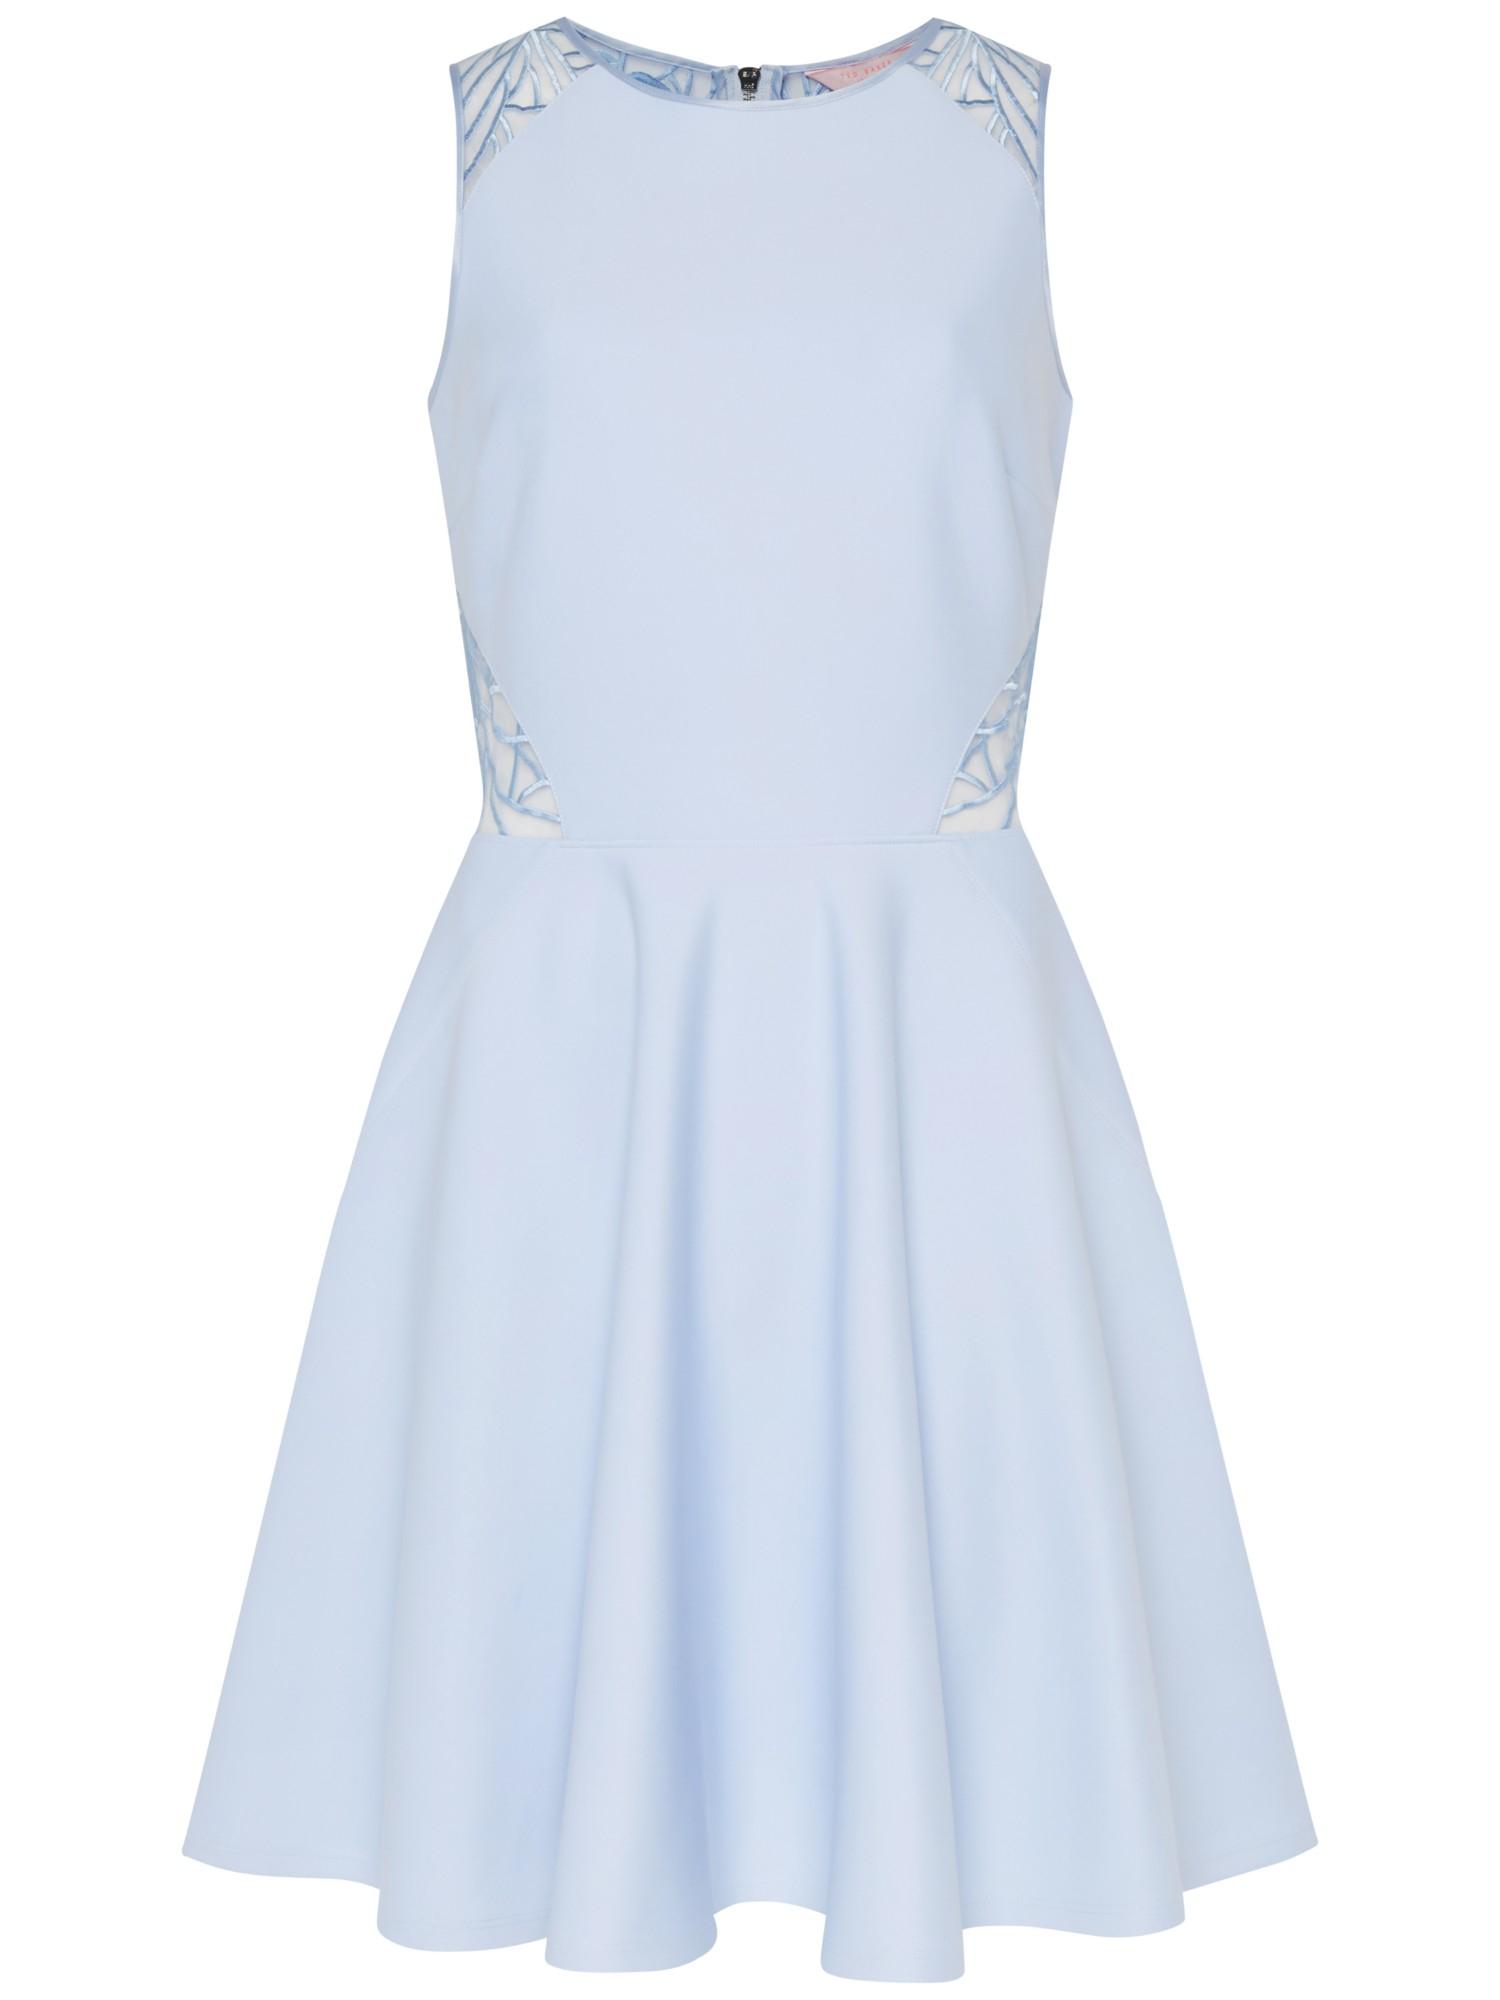 f3fba3d6f9e21b Ted Baker Venma Lace Detail Skater Dress in Blue - Lyst